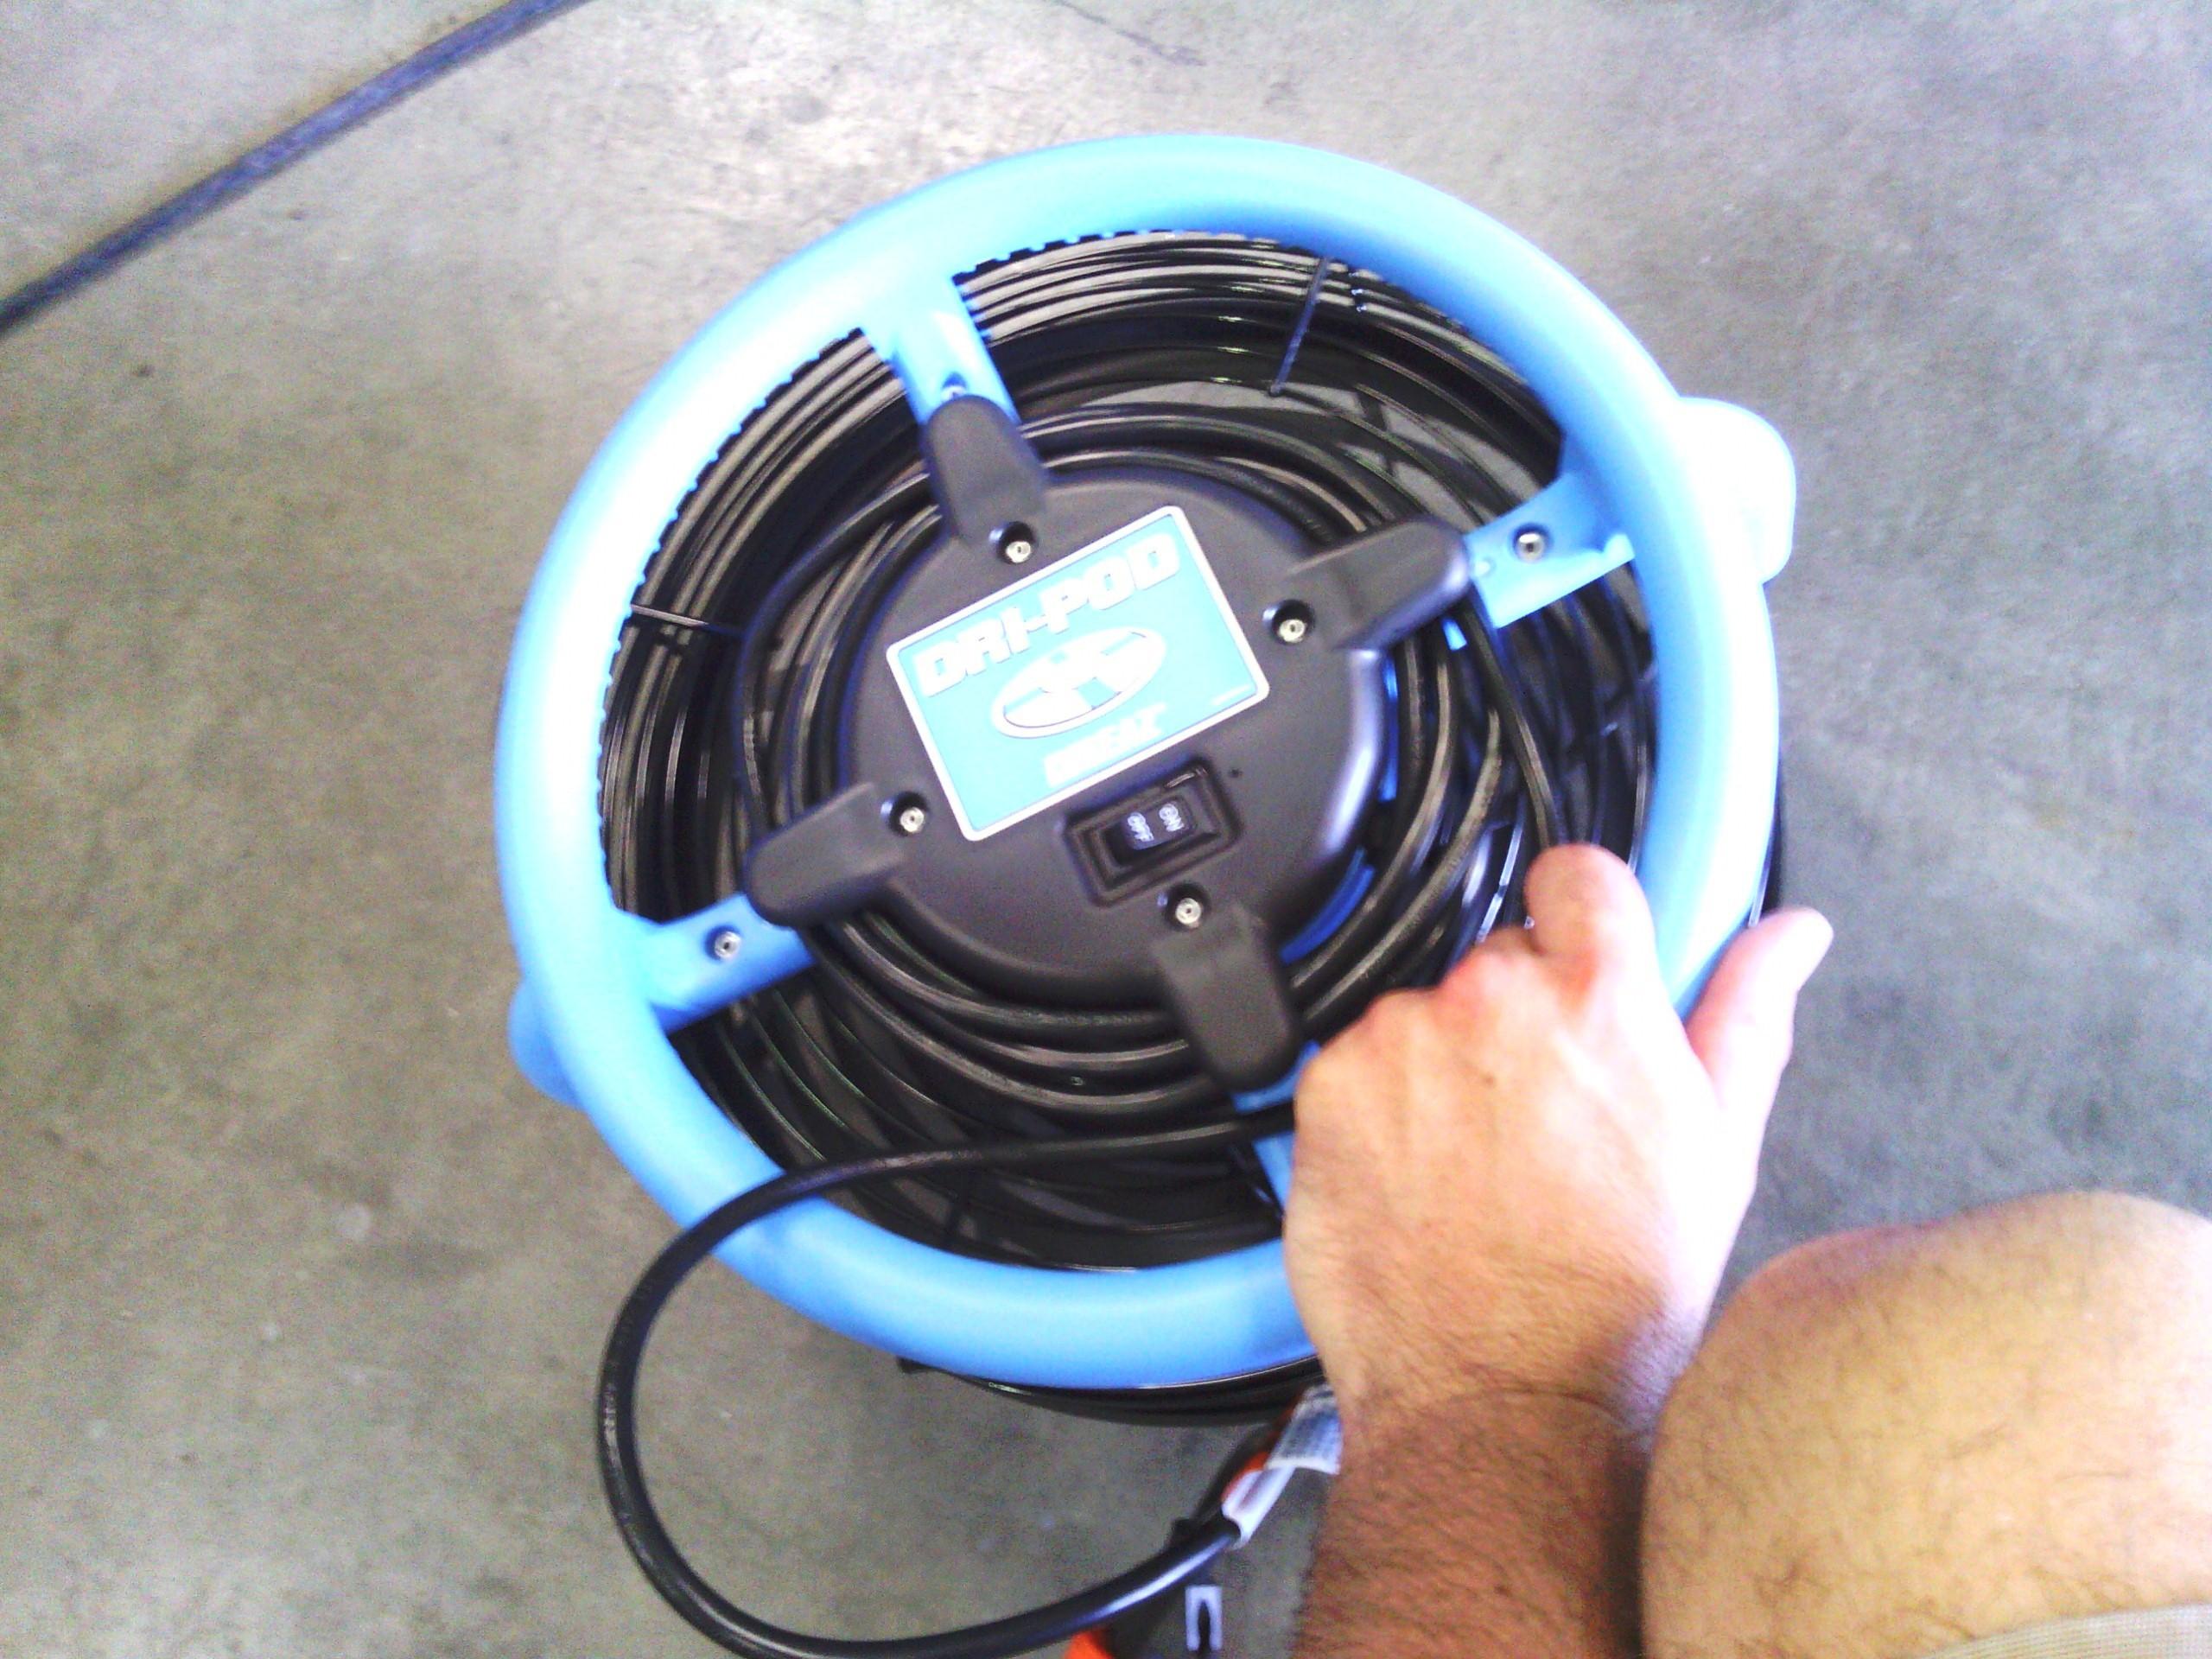 dri-pod dripad drieaz dri-eaz down draft air mover floor fan